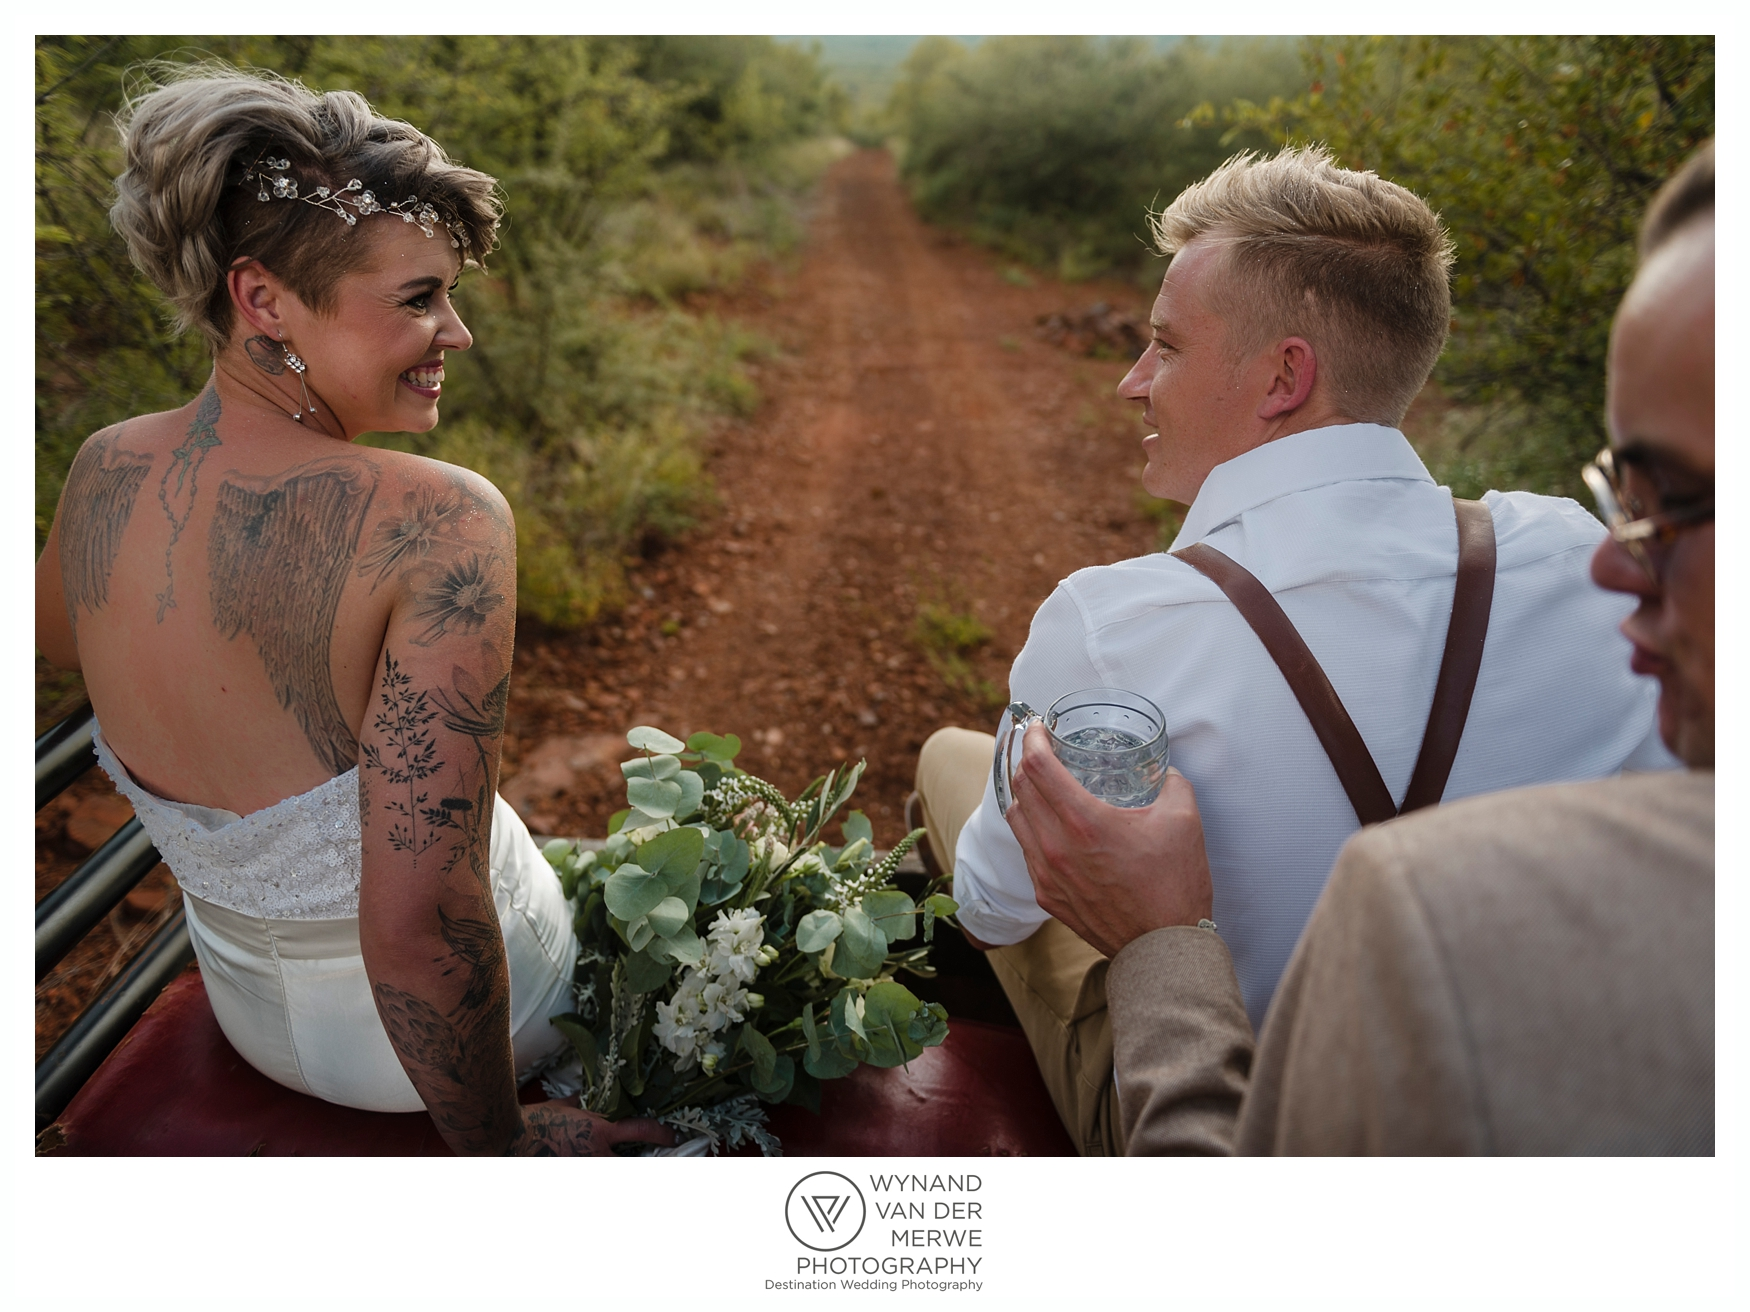 WynandvanderMerwe_weddingphotography_bushveldwedding_northam_bushveld_limpopowedding_limpopo_southafrica-158.jpg